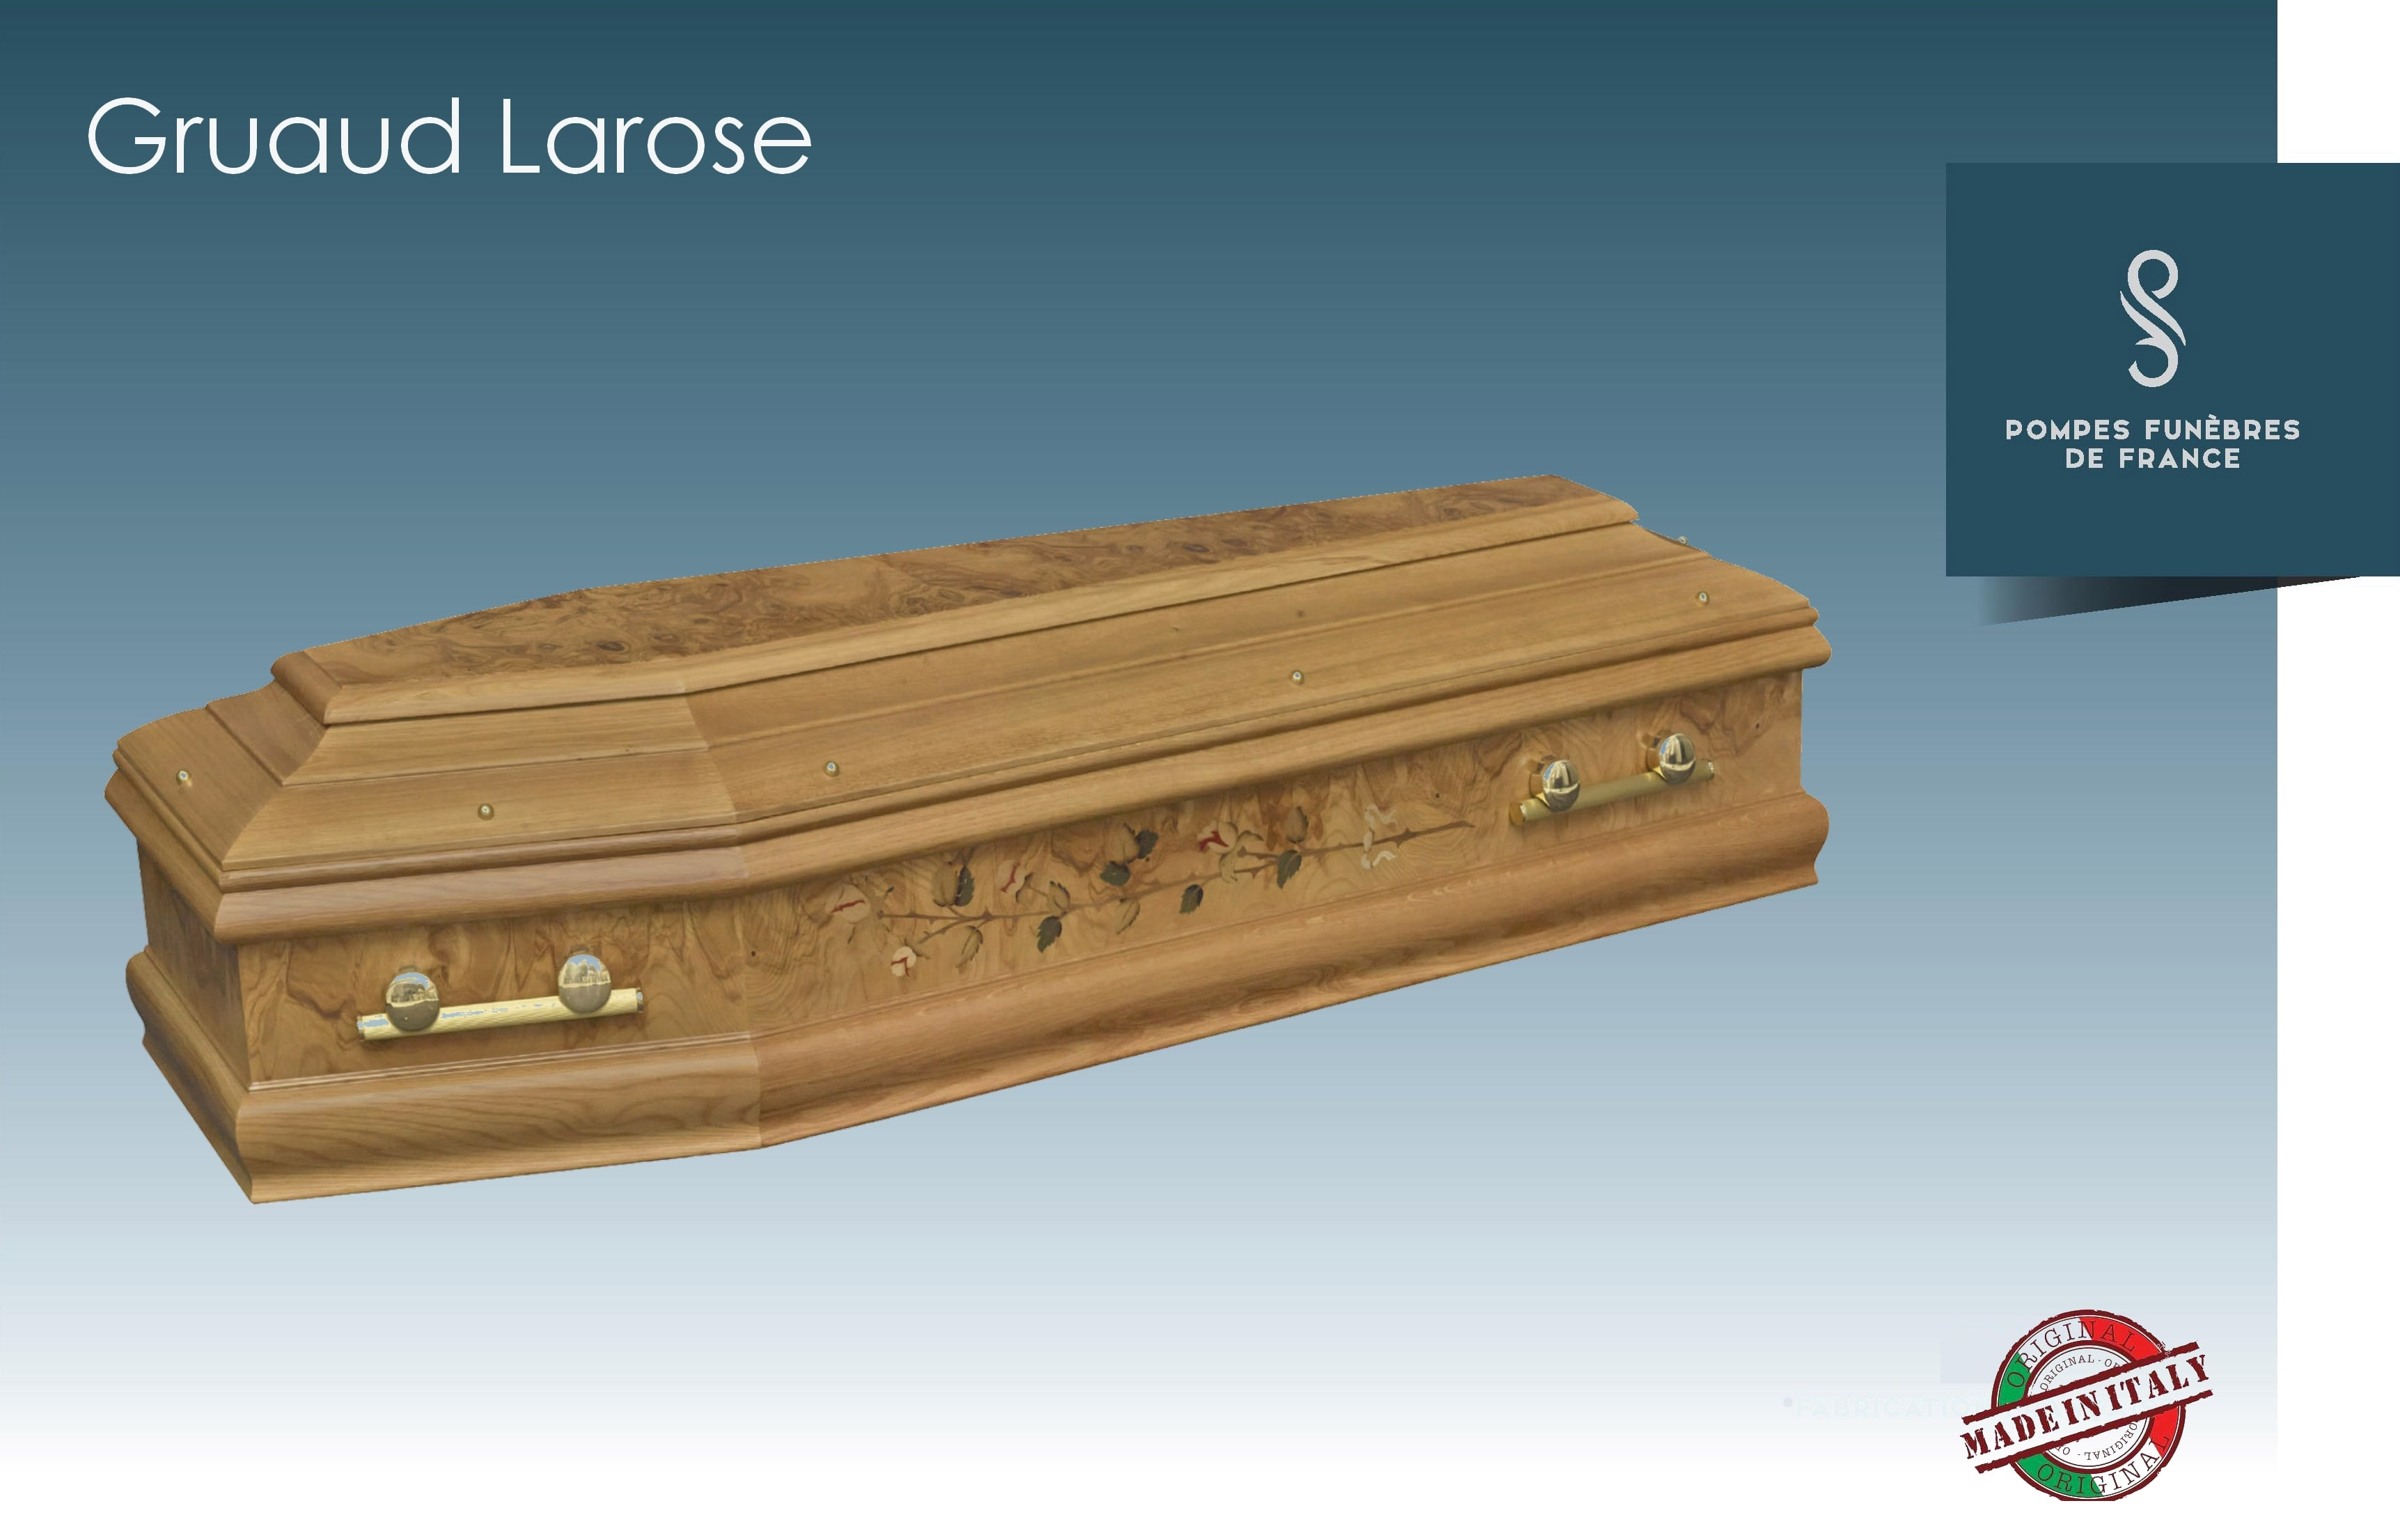 Cercueil Gruaud Larose